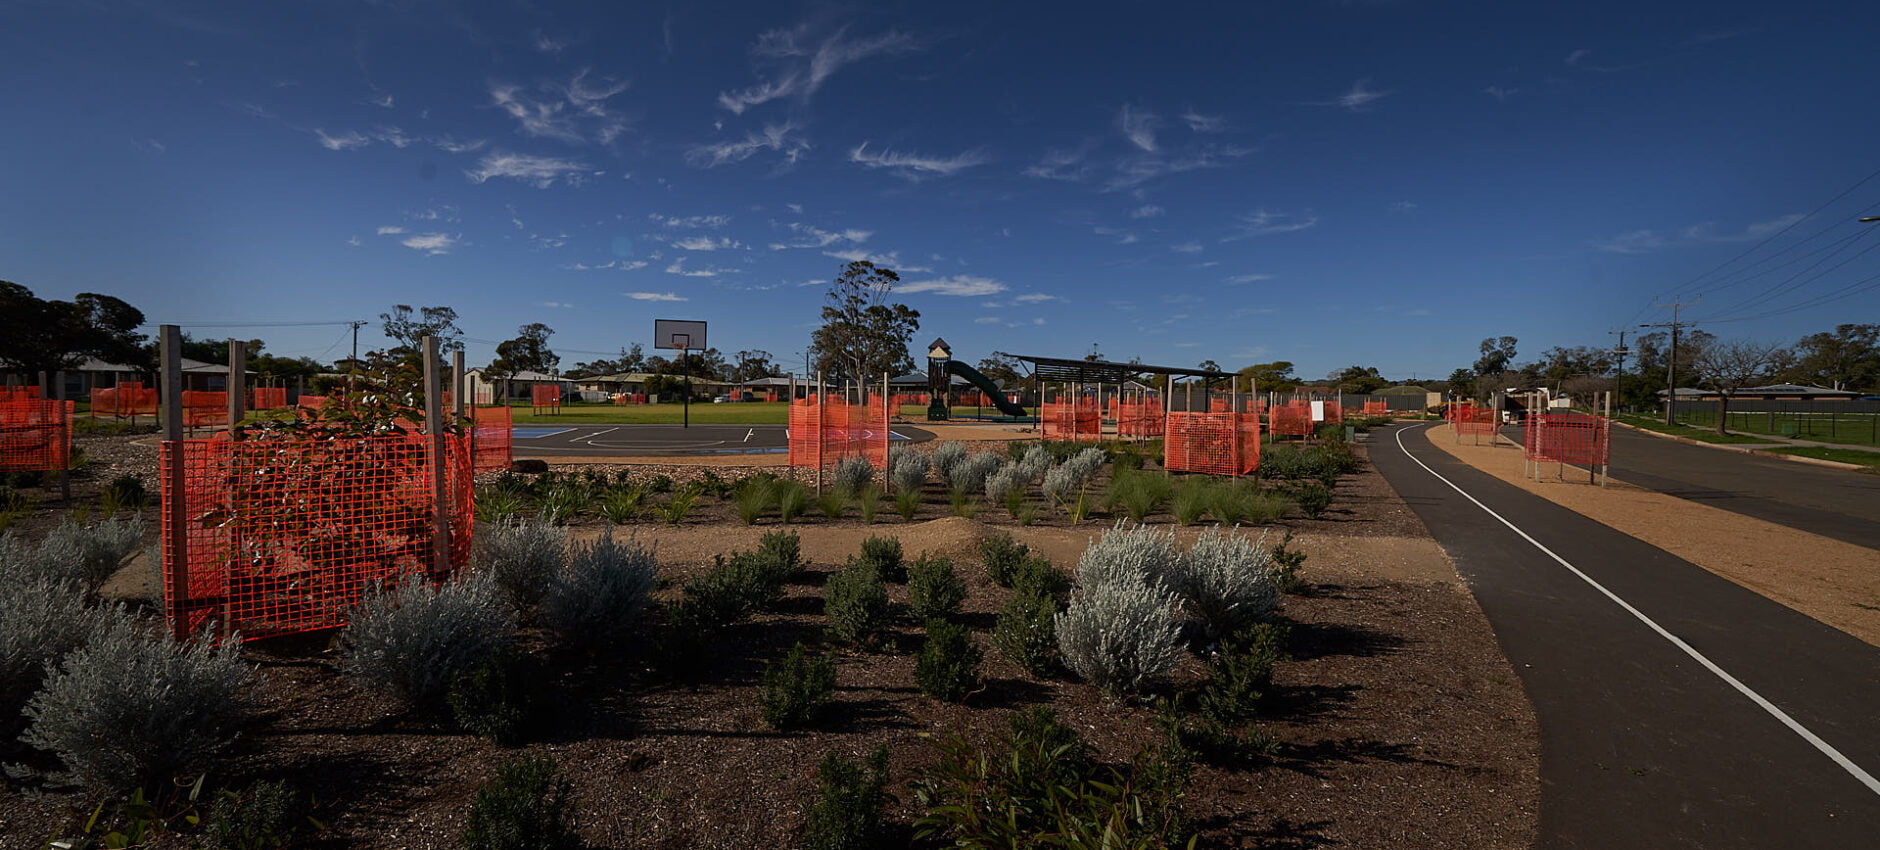 Space-Landscape-Construction_Webster-Reserve_Davoren-Park_Jun2020_0009_LoRes.jpg